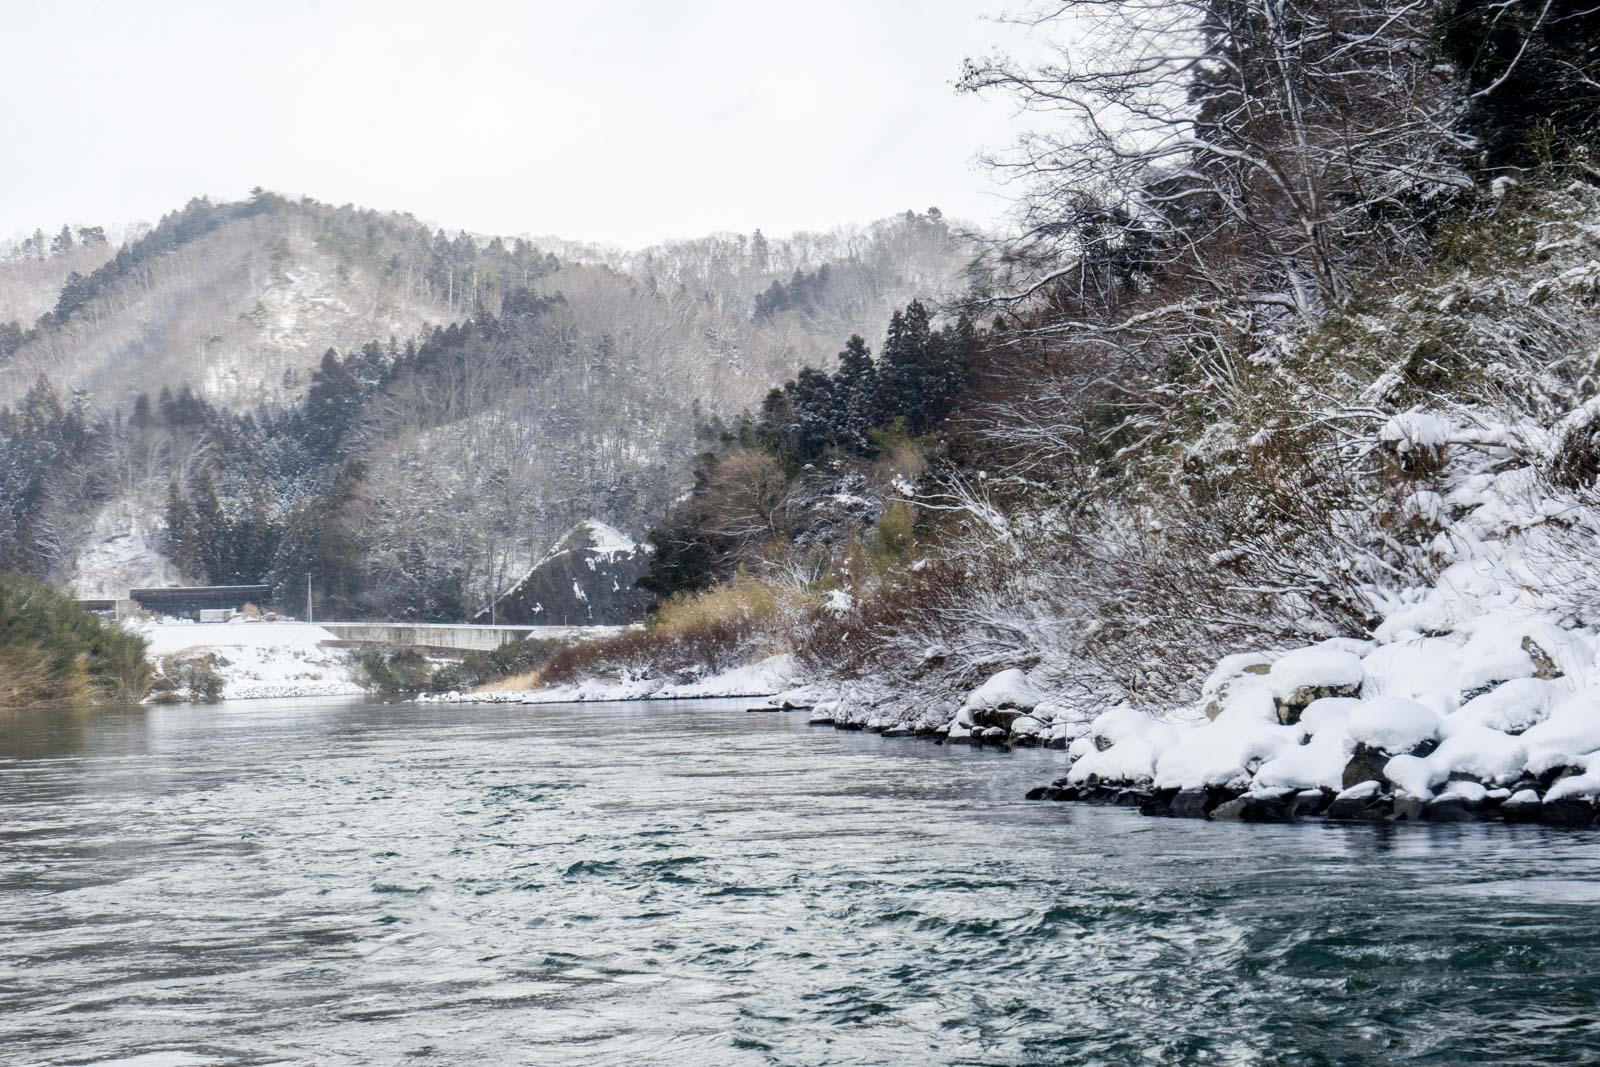 Abukuma River Boat, Miyagi Prefecture, Japan